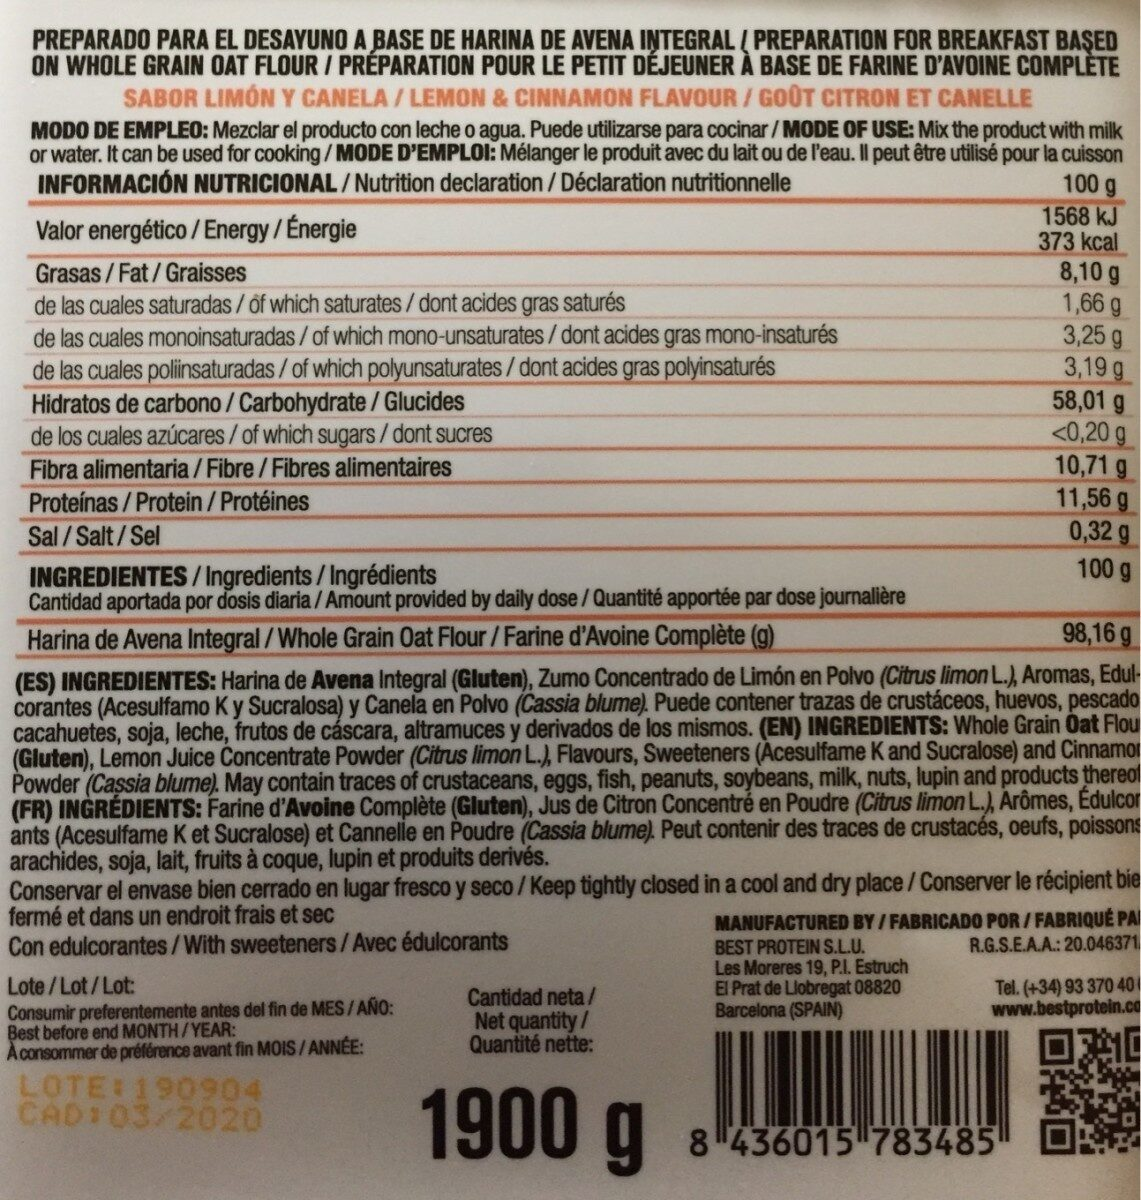 Harina de avena integral - Nutrition facts